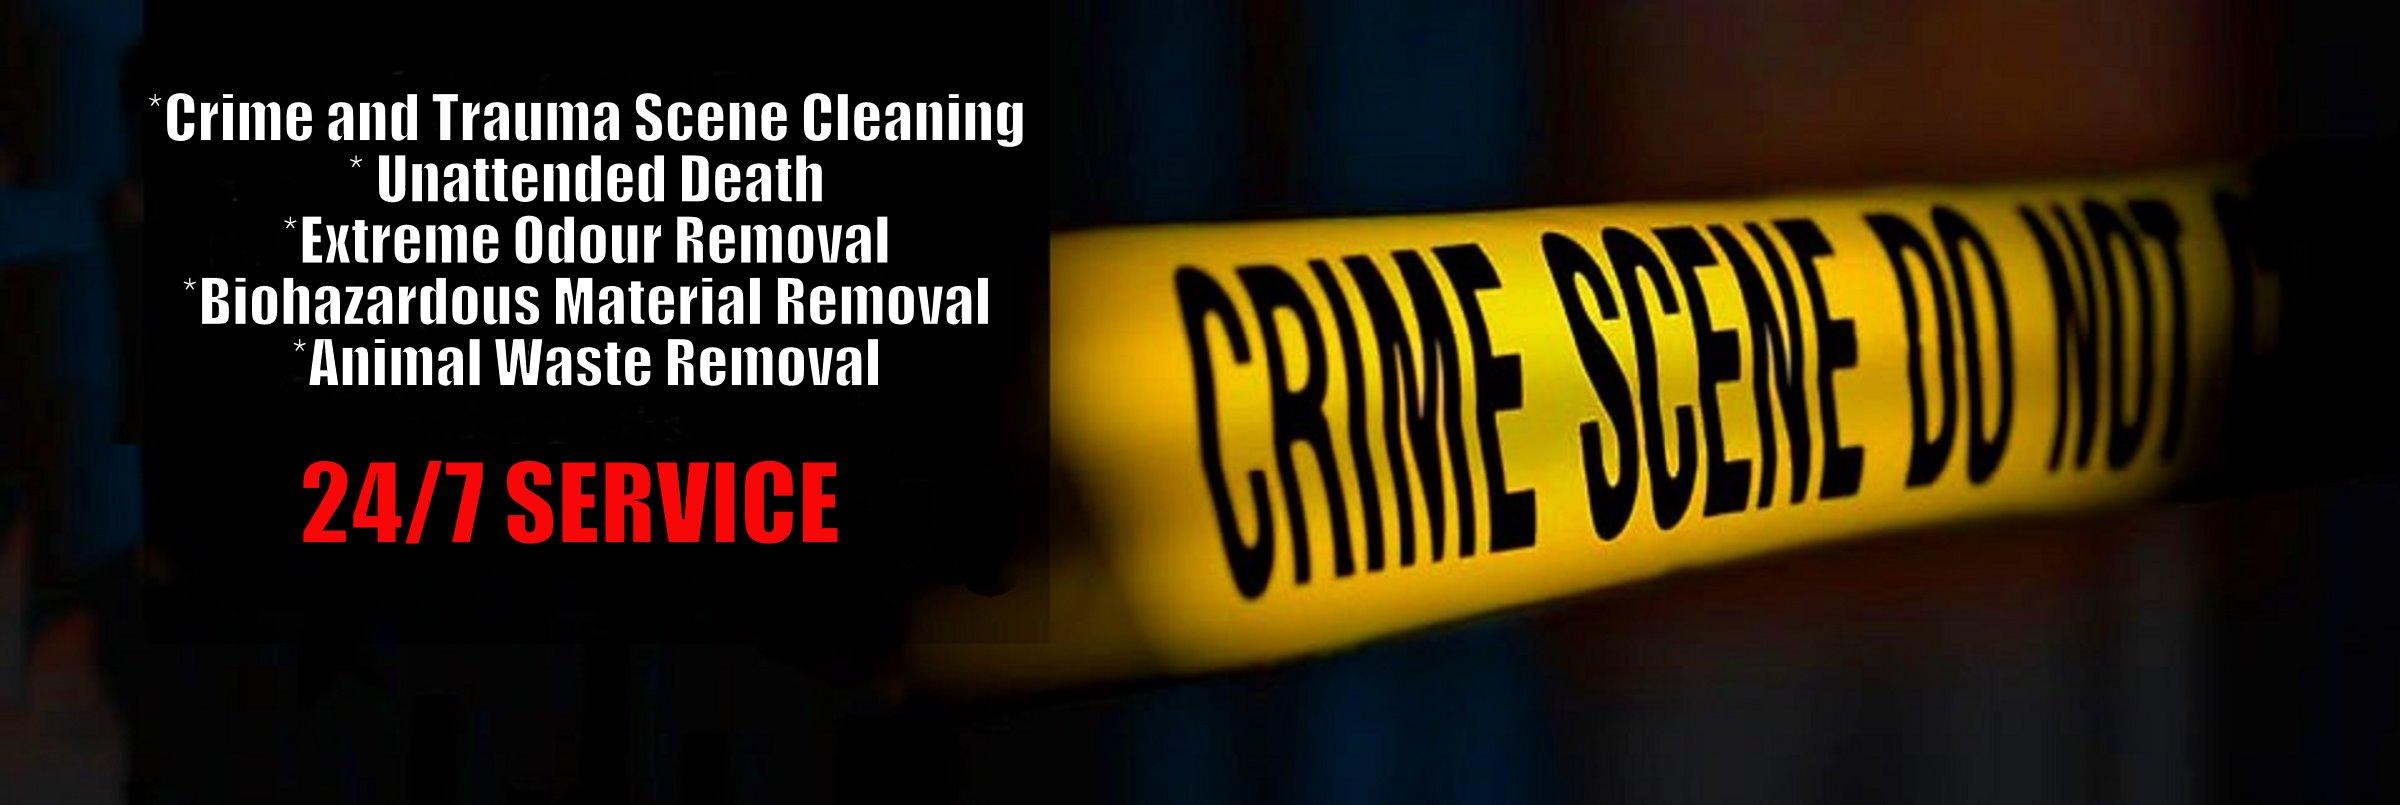 trauma scene cleaning ottawa